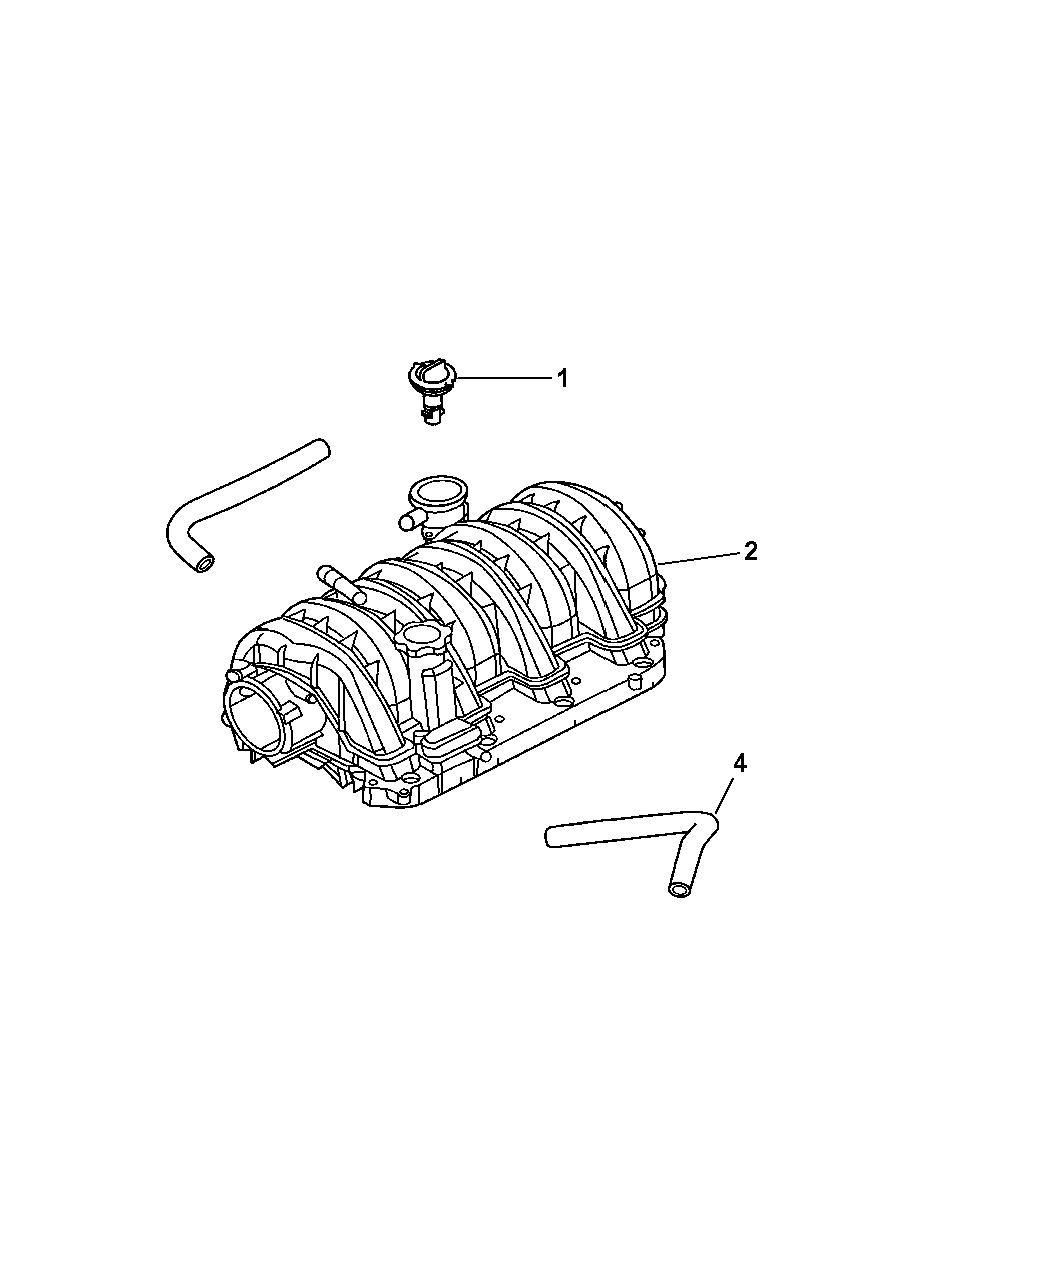 2005 Jeep Grand Cherokee Crankcase Ventilation Engine Diagram Thumbnail 1